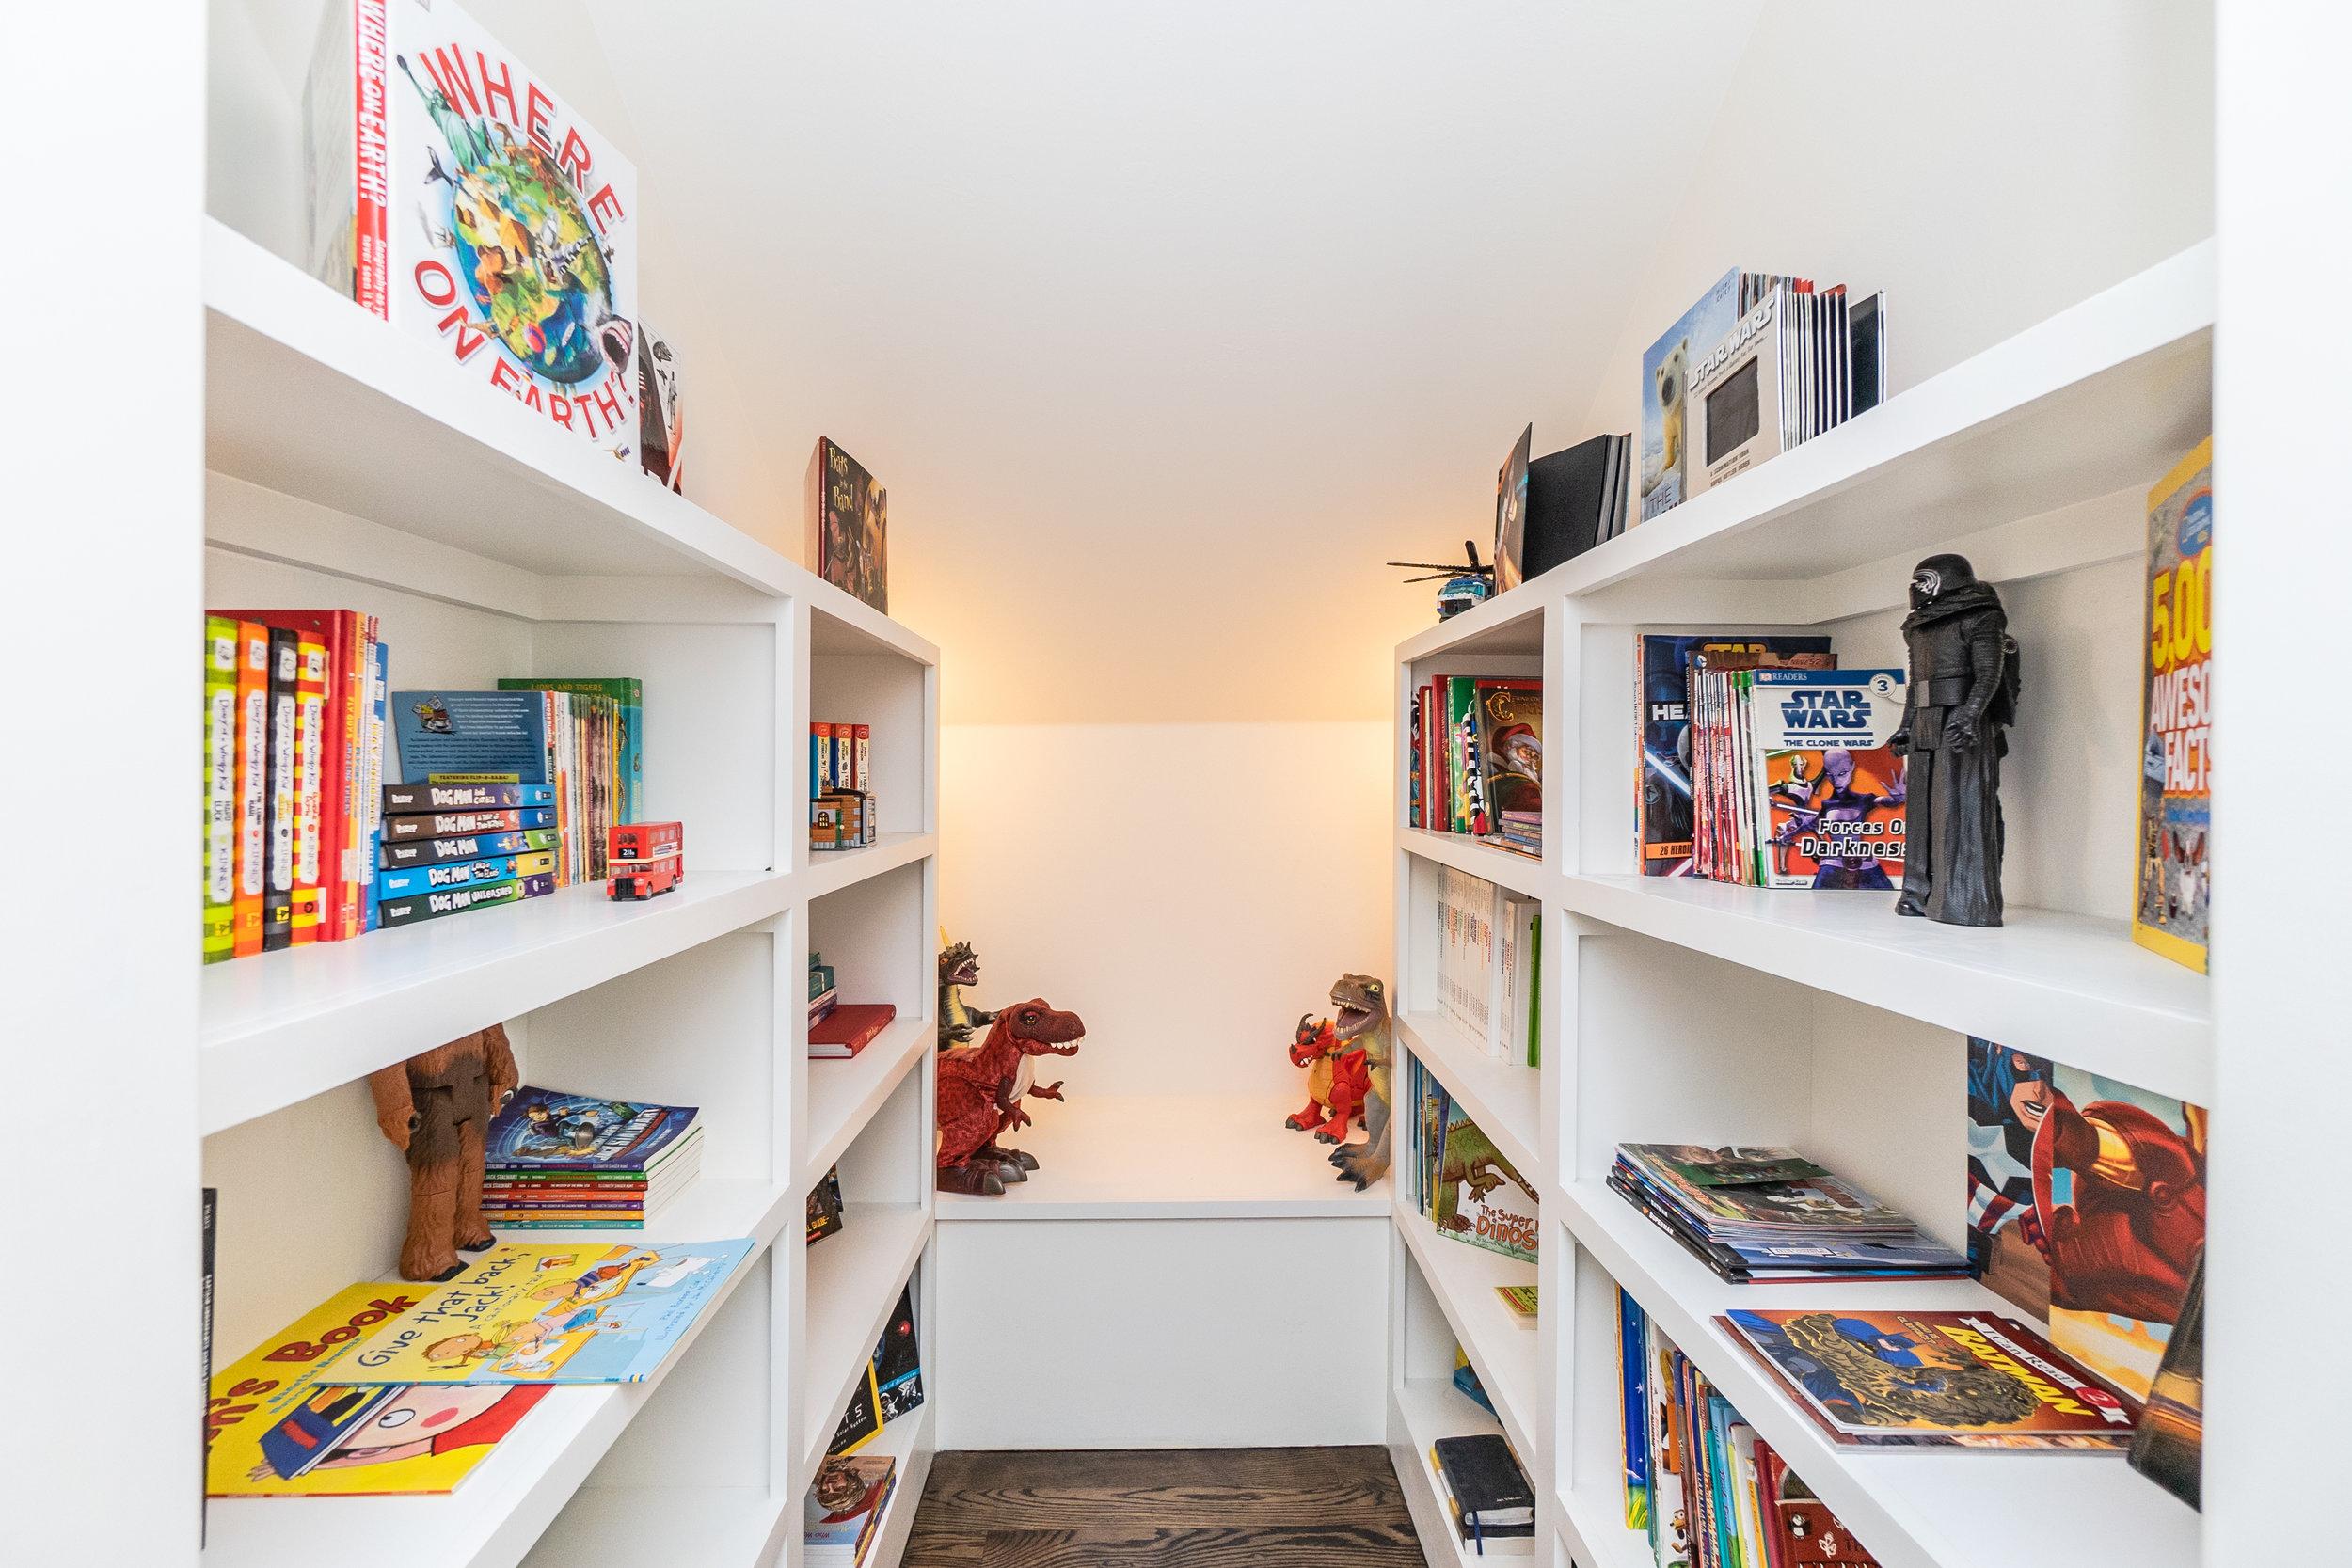 Upper level children's nook/library.